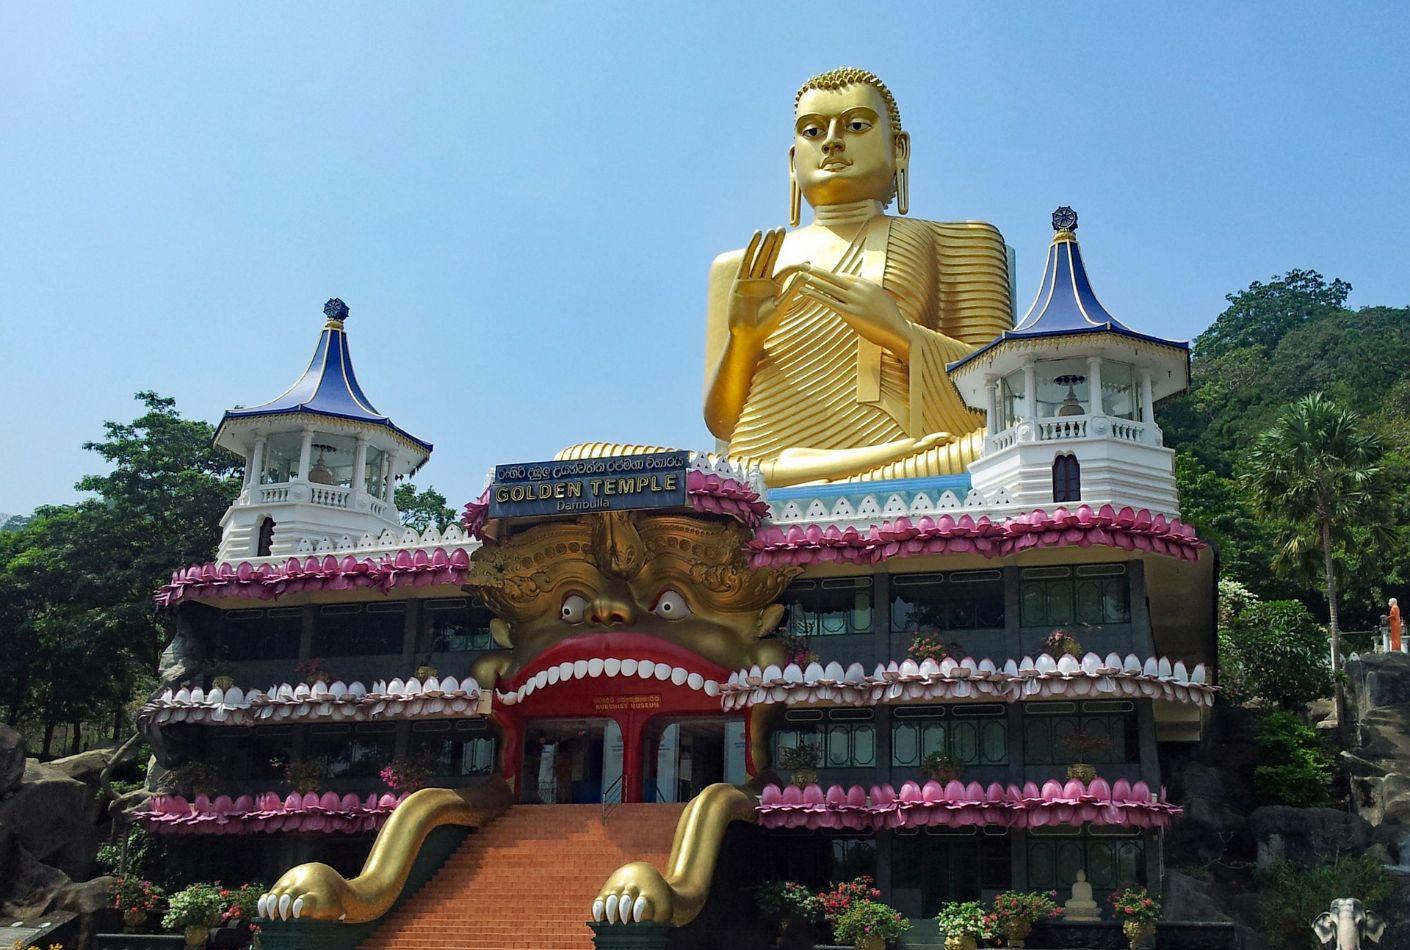 Templo de Dambulla con el gigante buda de oro. Oferta viaje a Sri Lanka.